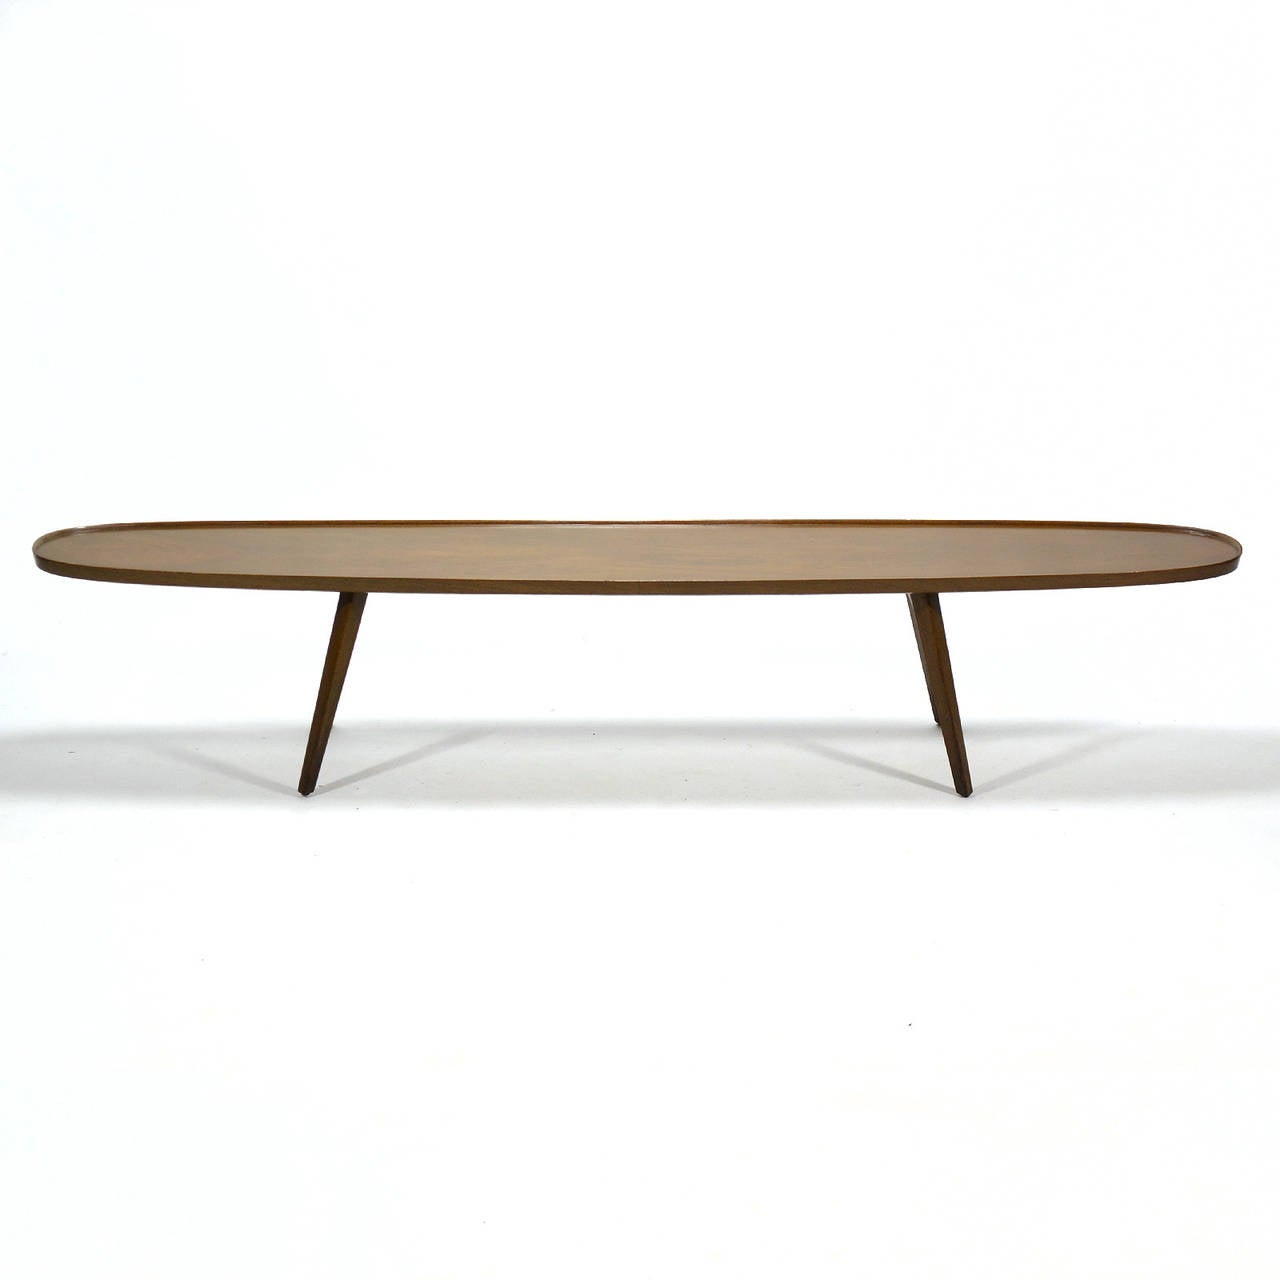 edward wormley surfboard coffee tabledunbar for sale at 1stdibs